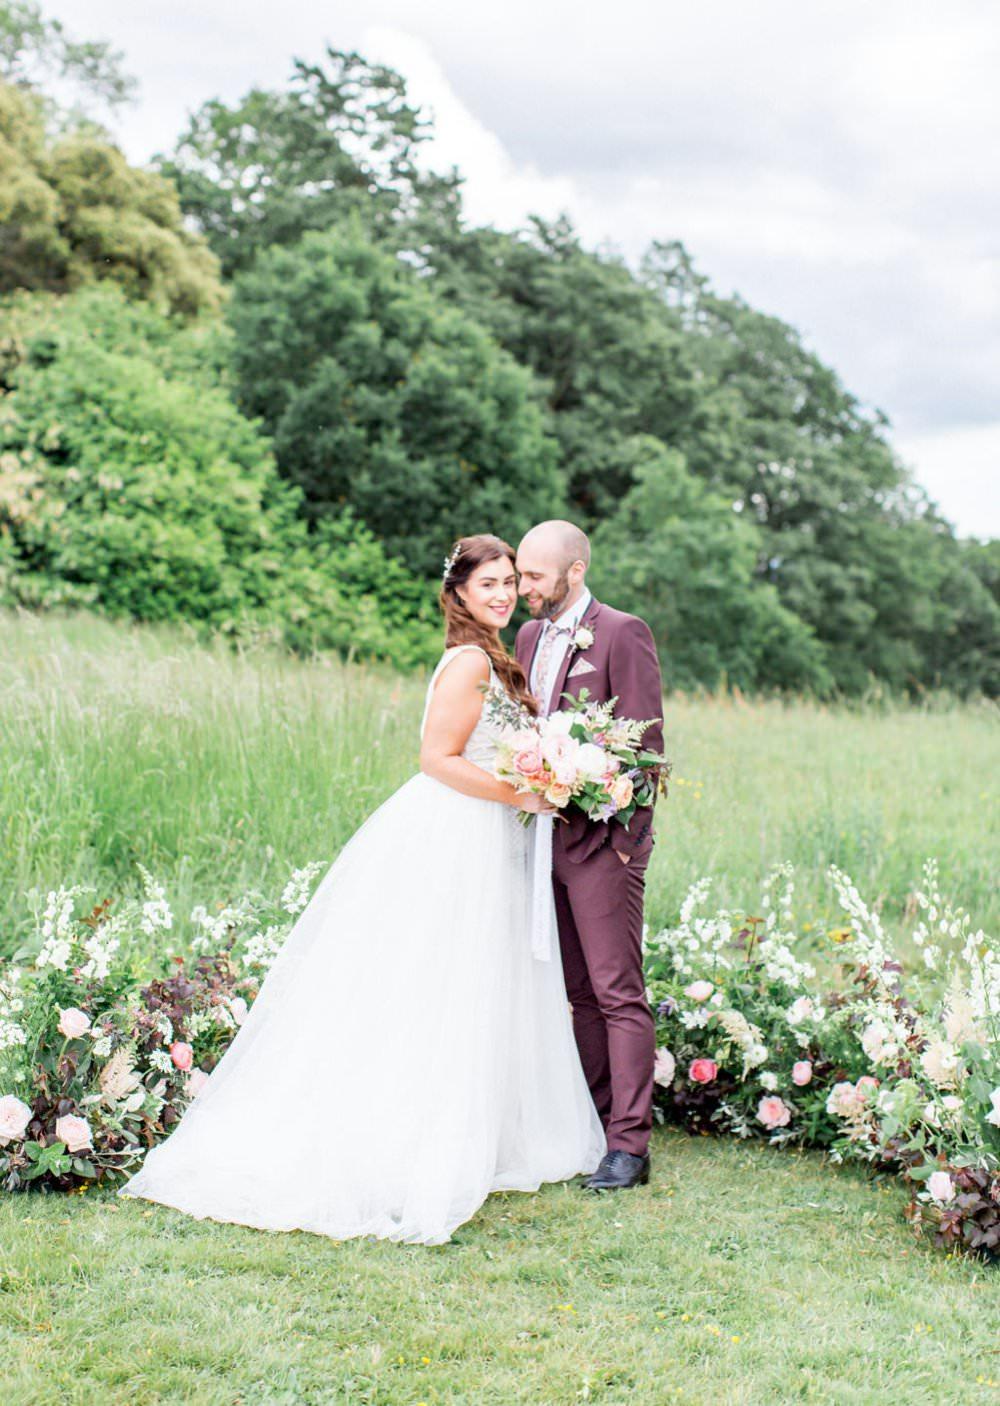 English Garden Wedding Inspiration Philippa Sian Photography Meadow Flowers Ceremony Backdrop Arrangement